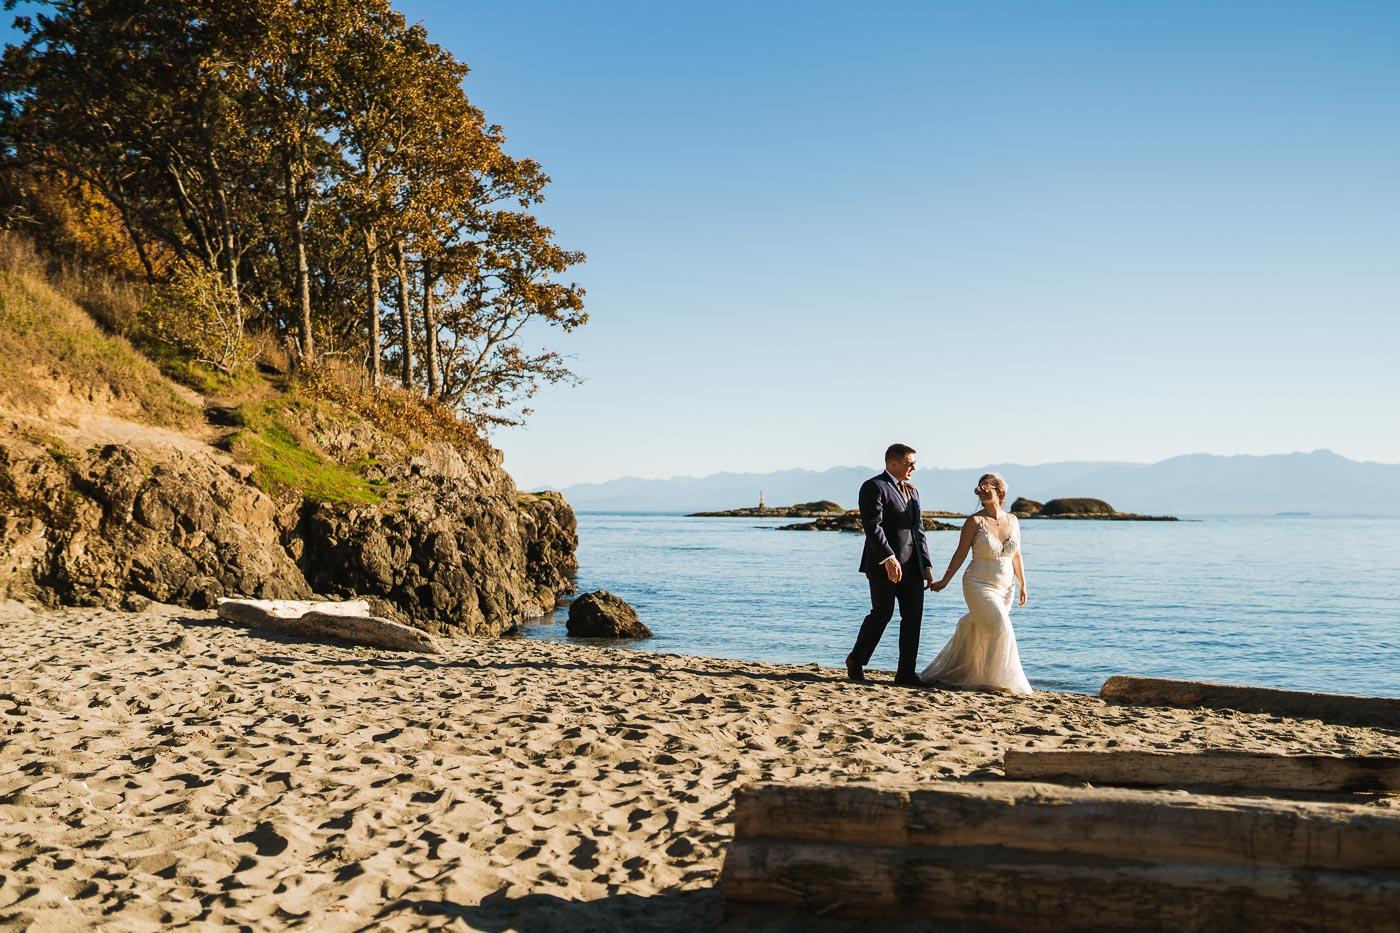 Jon-Mark Photography Victoria BC Wedding Photography - Hatley Castle Wedding Photography - Bear Mountain Wedding Photography bride groom beach